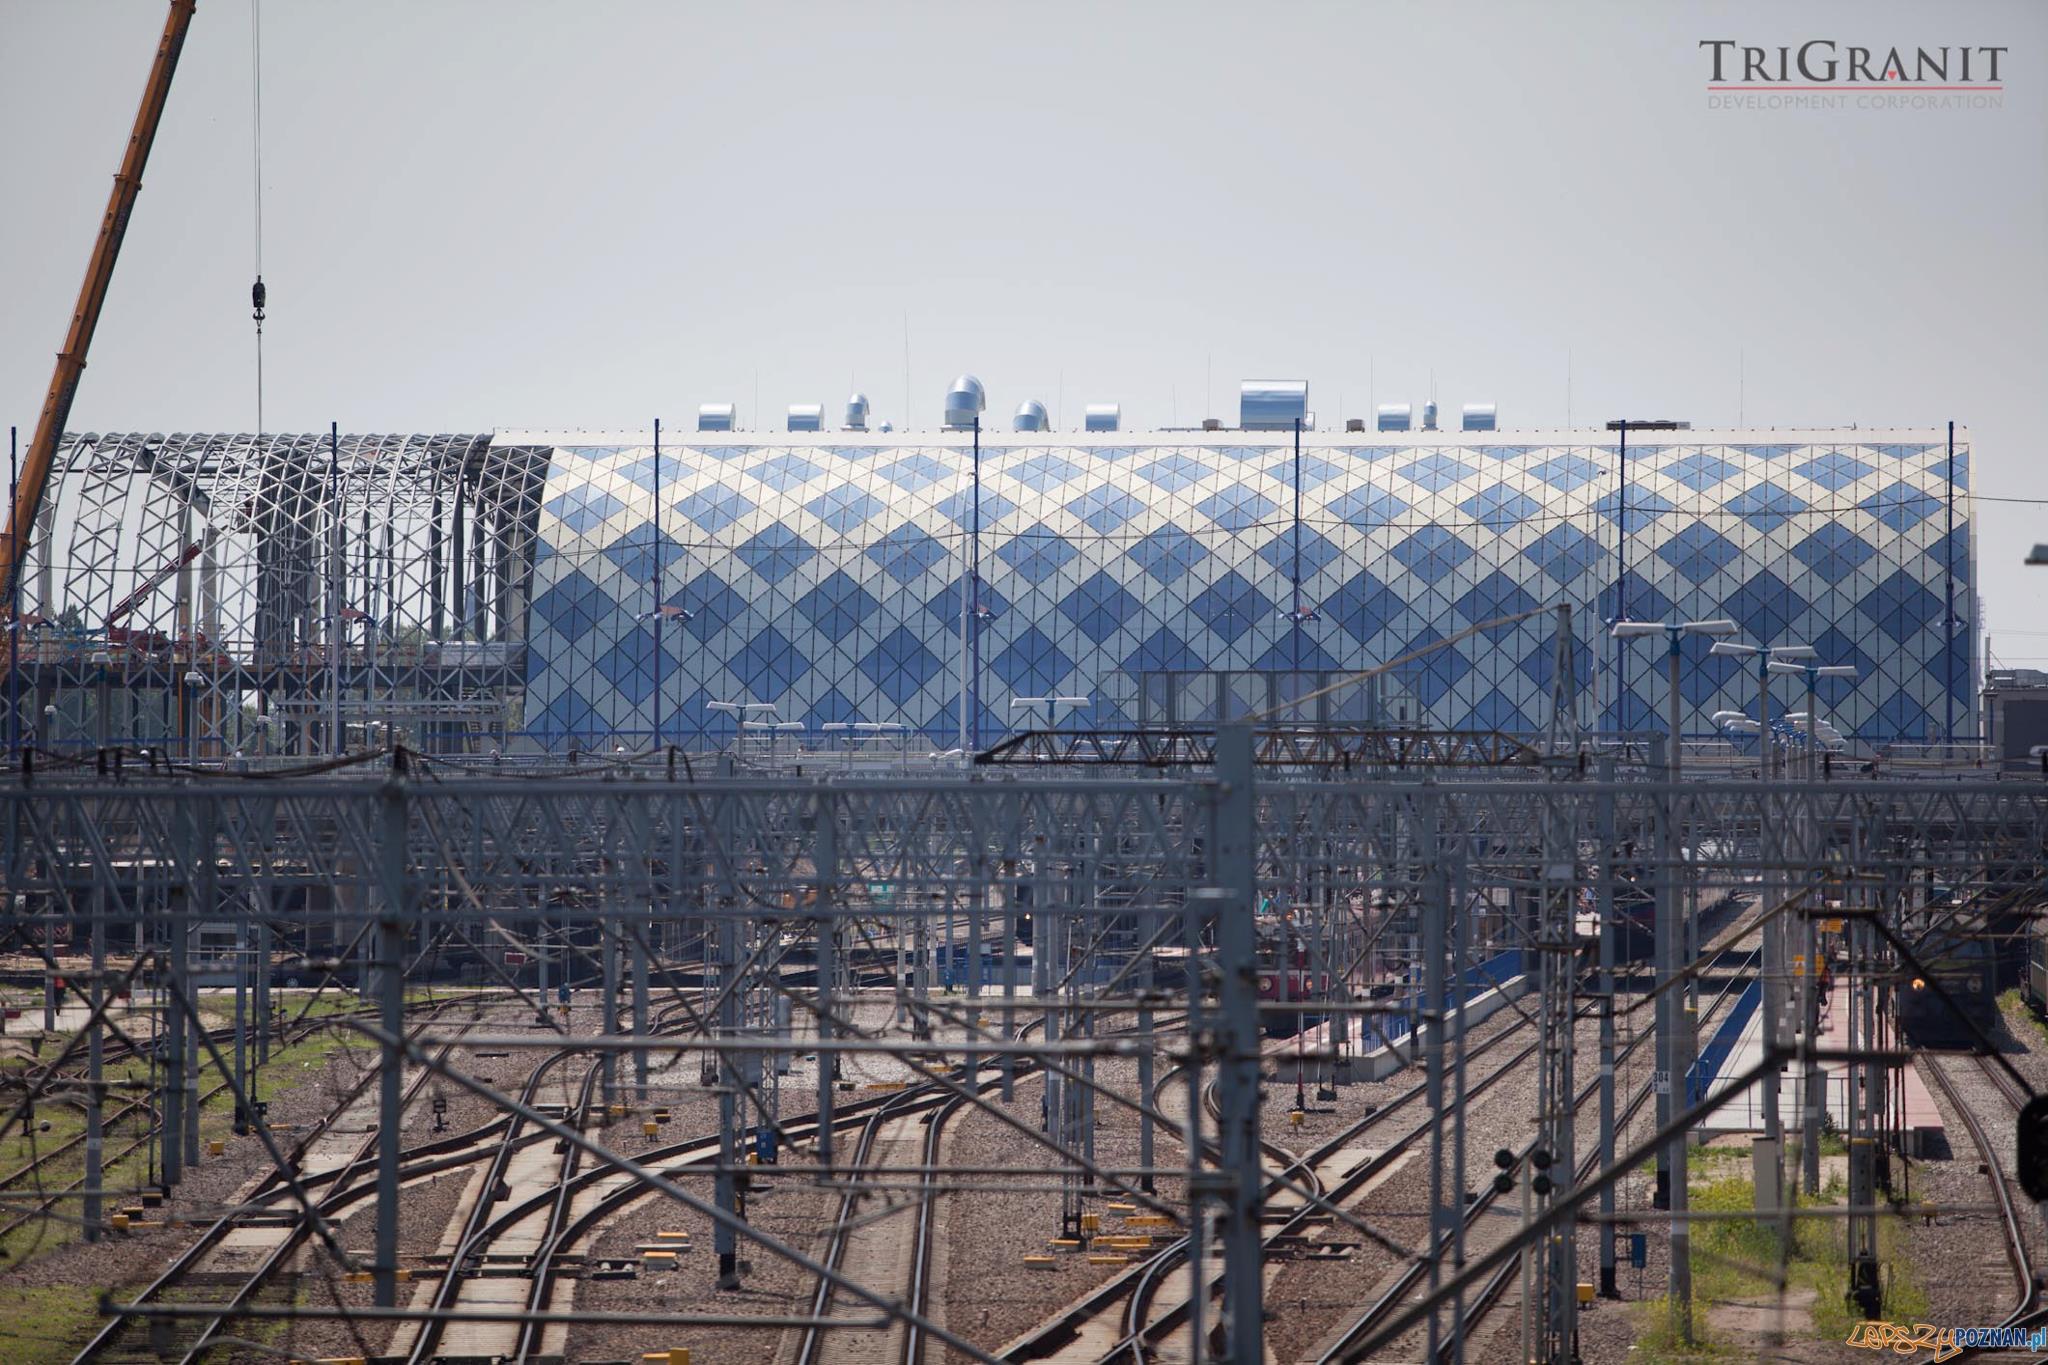 Nowy dworzec PKP Foto: Trigranit